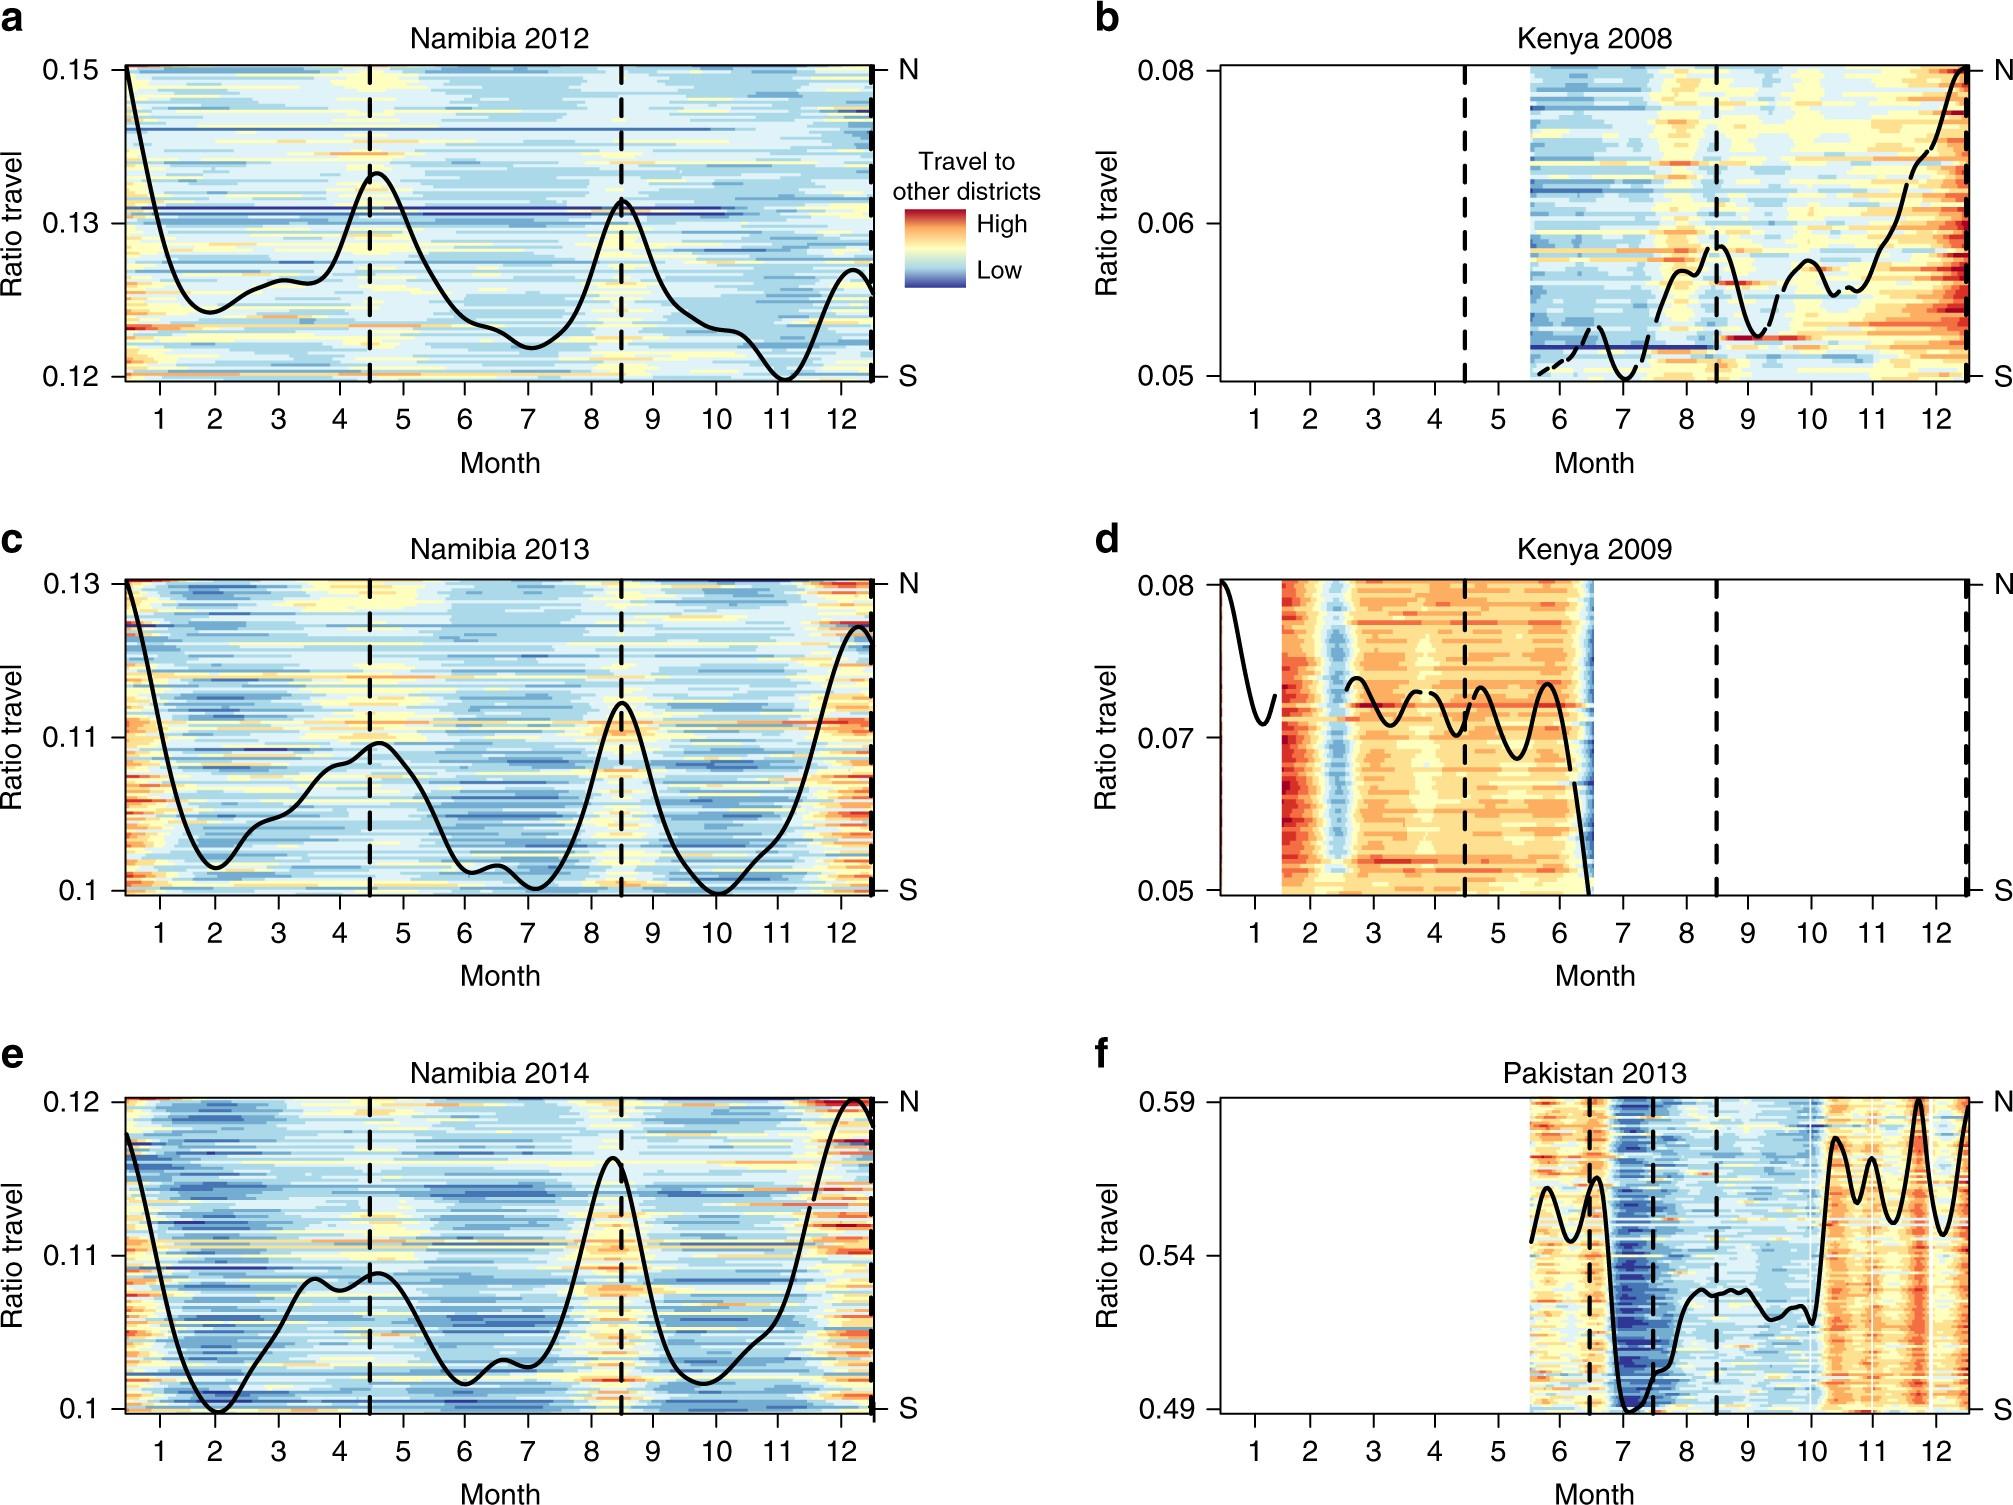 Multinational patterns of seasonal asymmetry in human